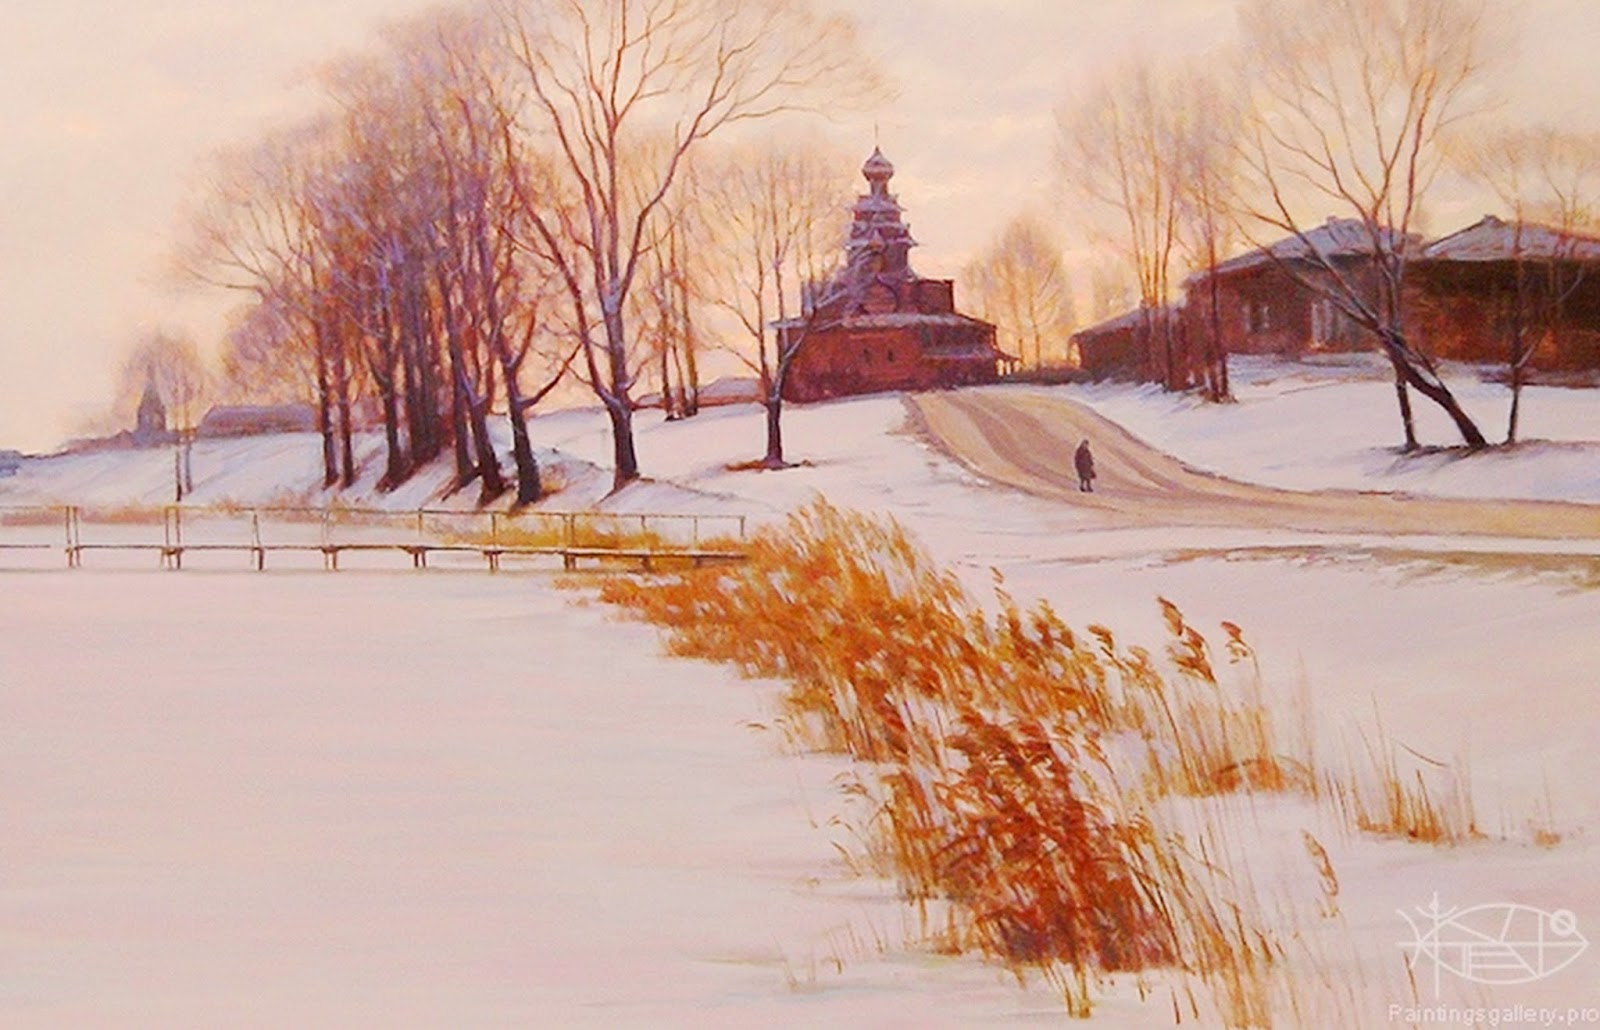 pinturas-al-oleo-de-paisajes-rurales